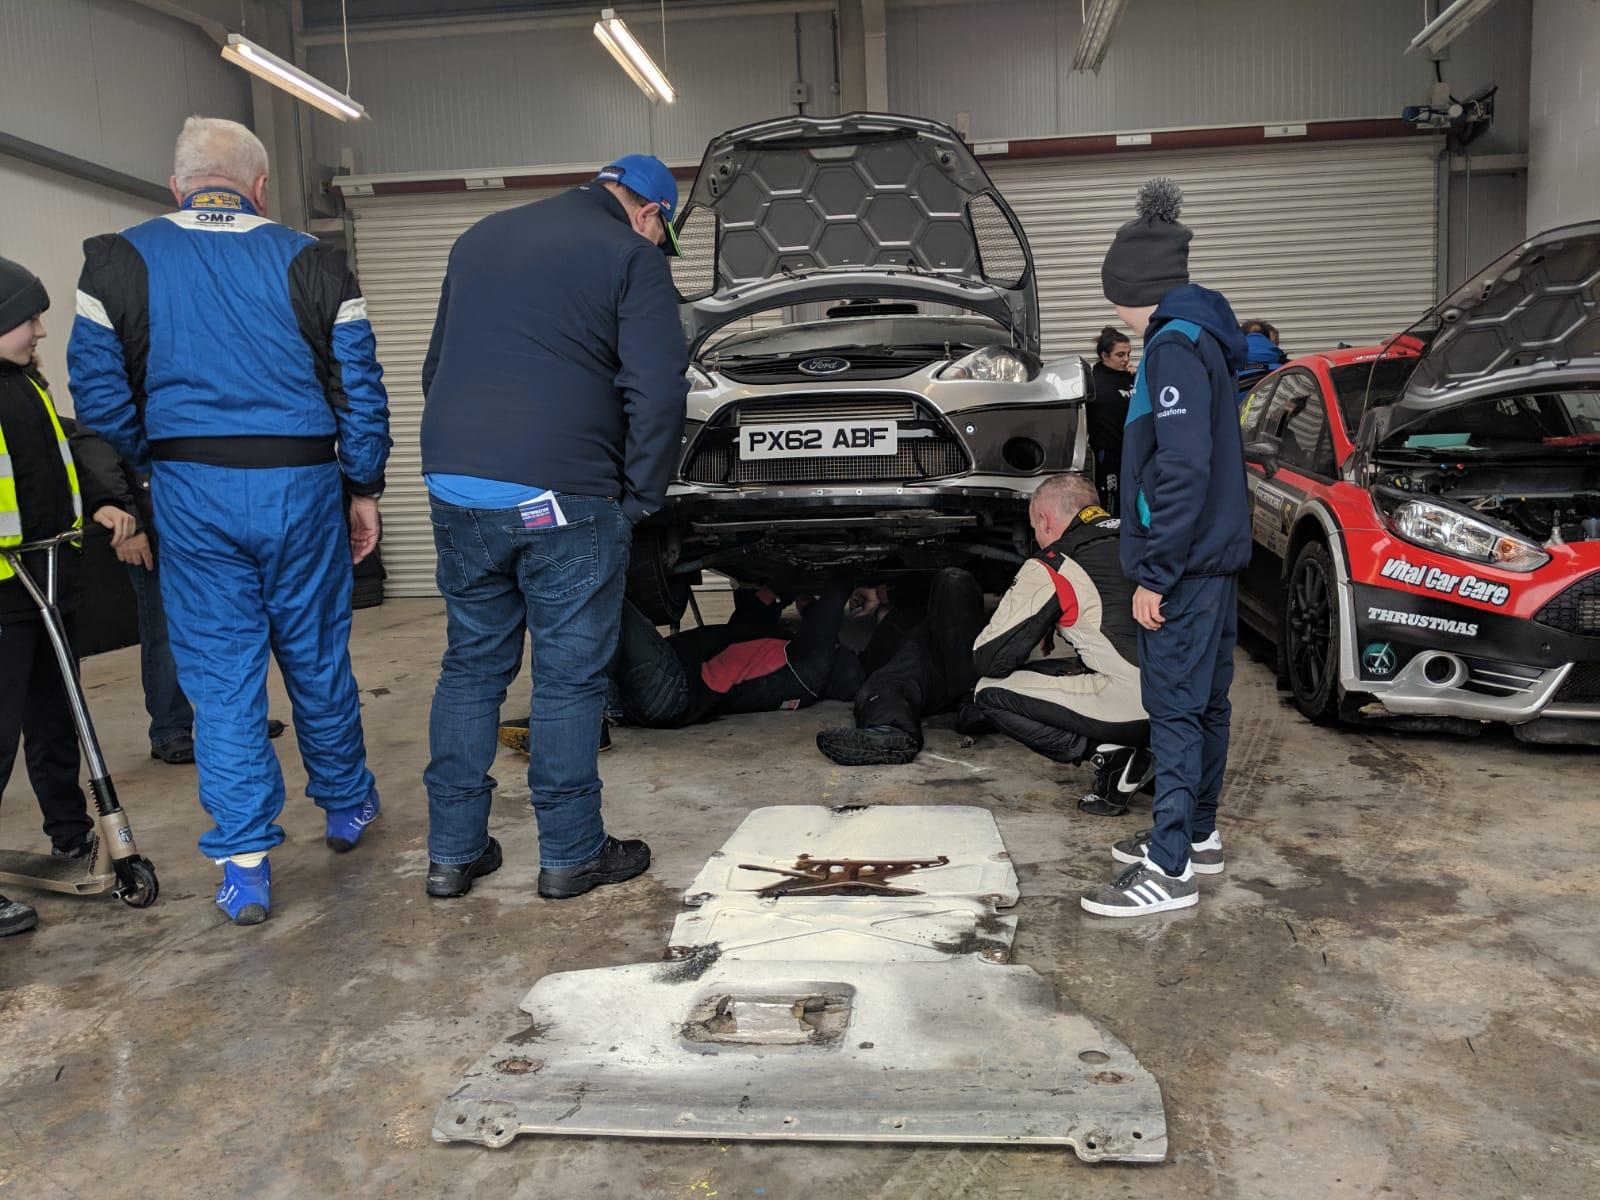 Derek McGarrity's stricken Fiesta WRC